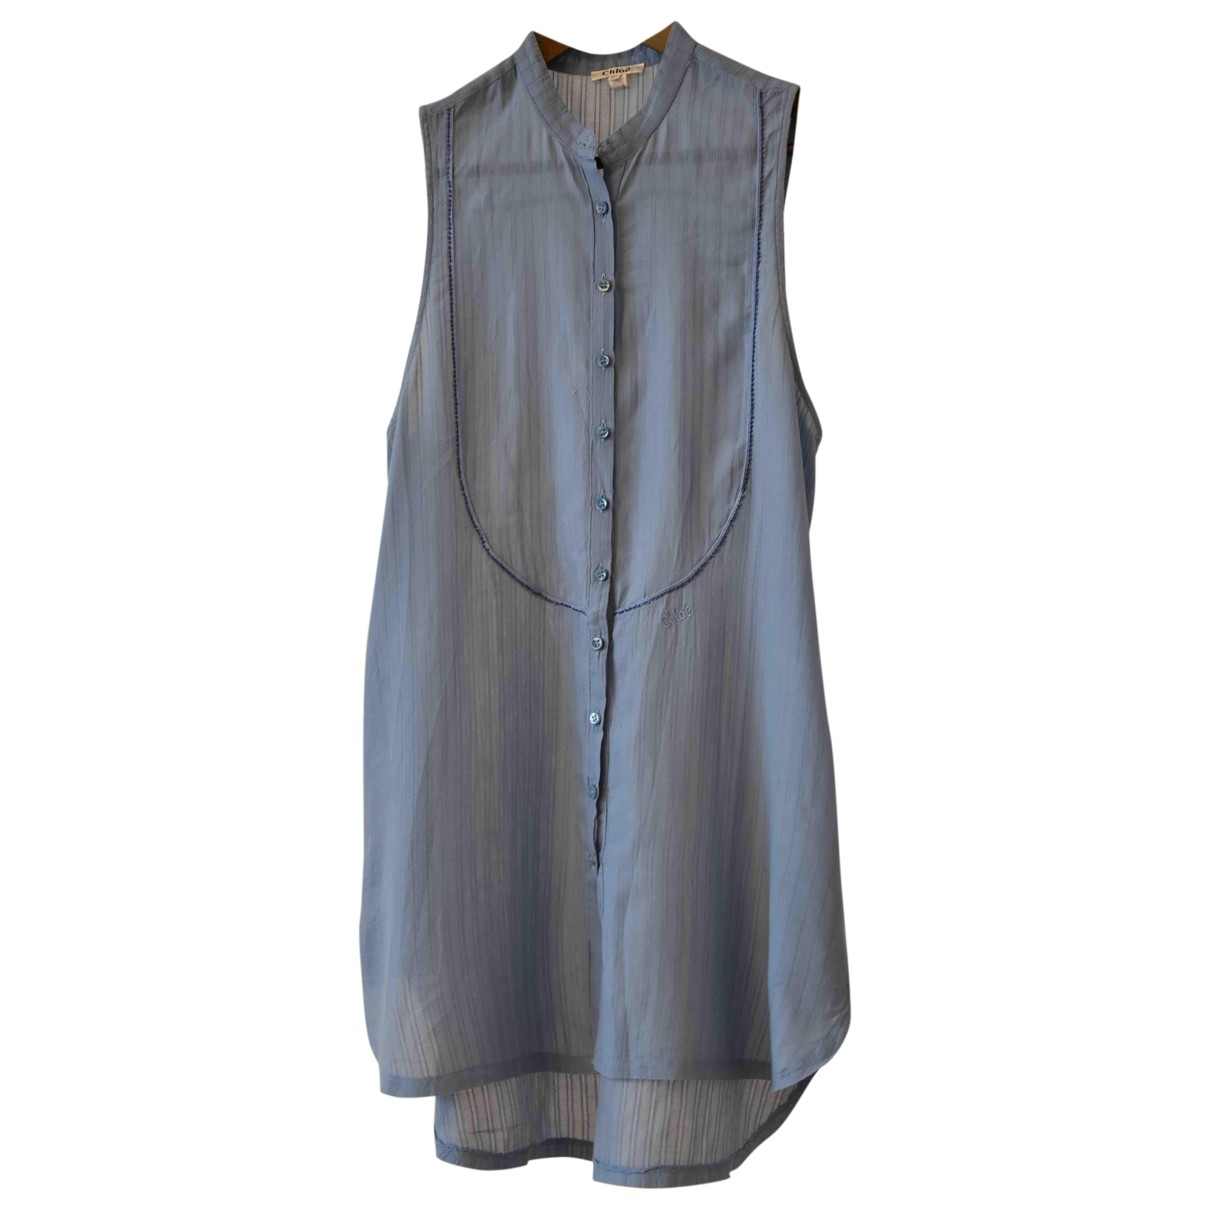 Chloé \N Blue Cotton dress for Women 42 IT